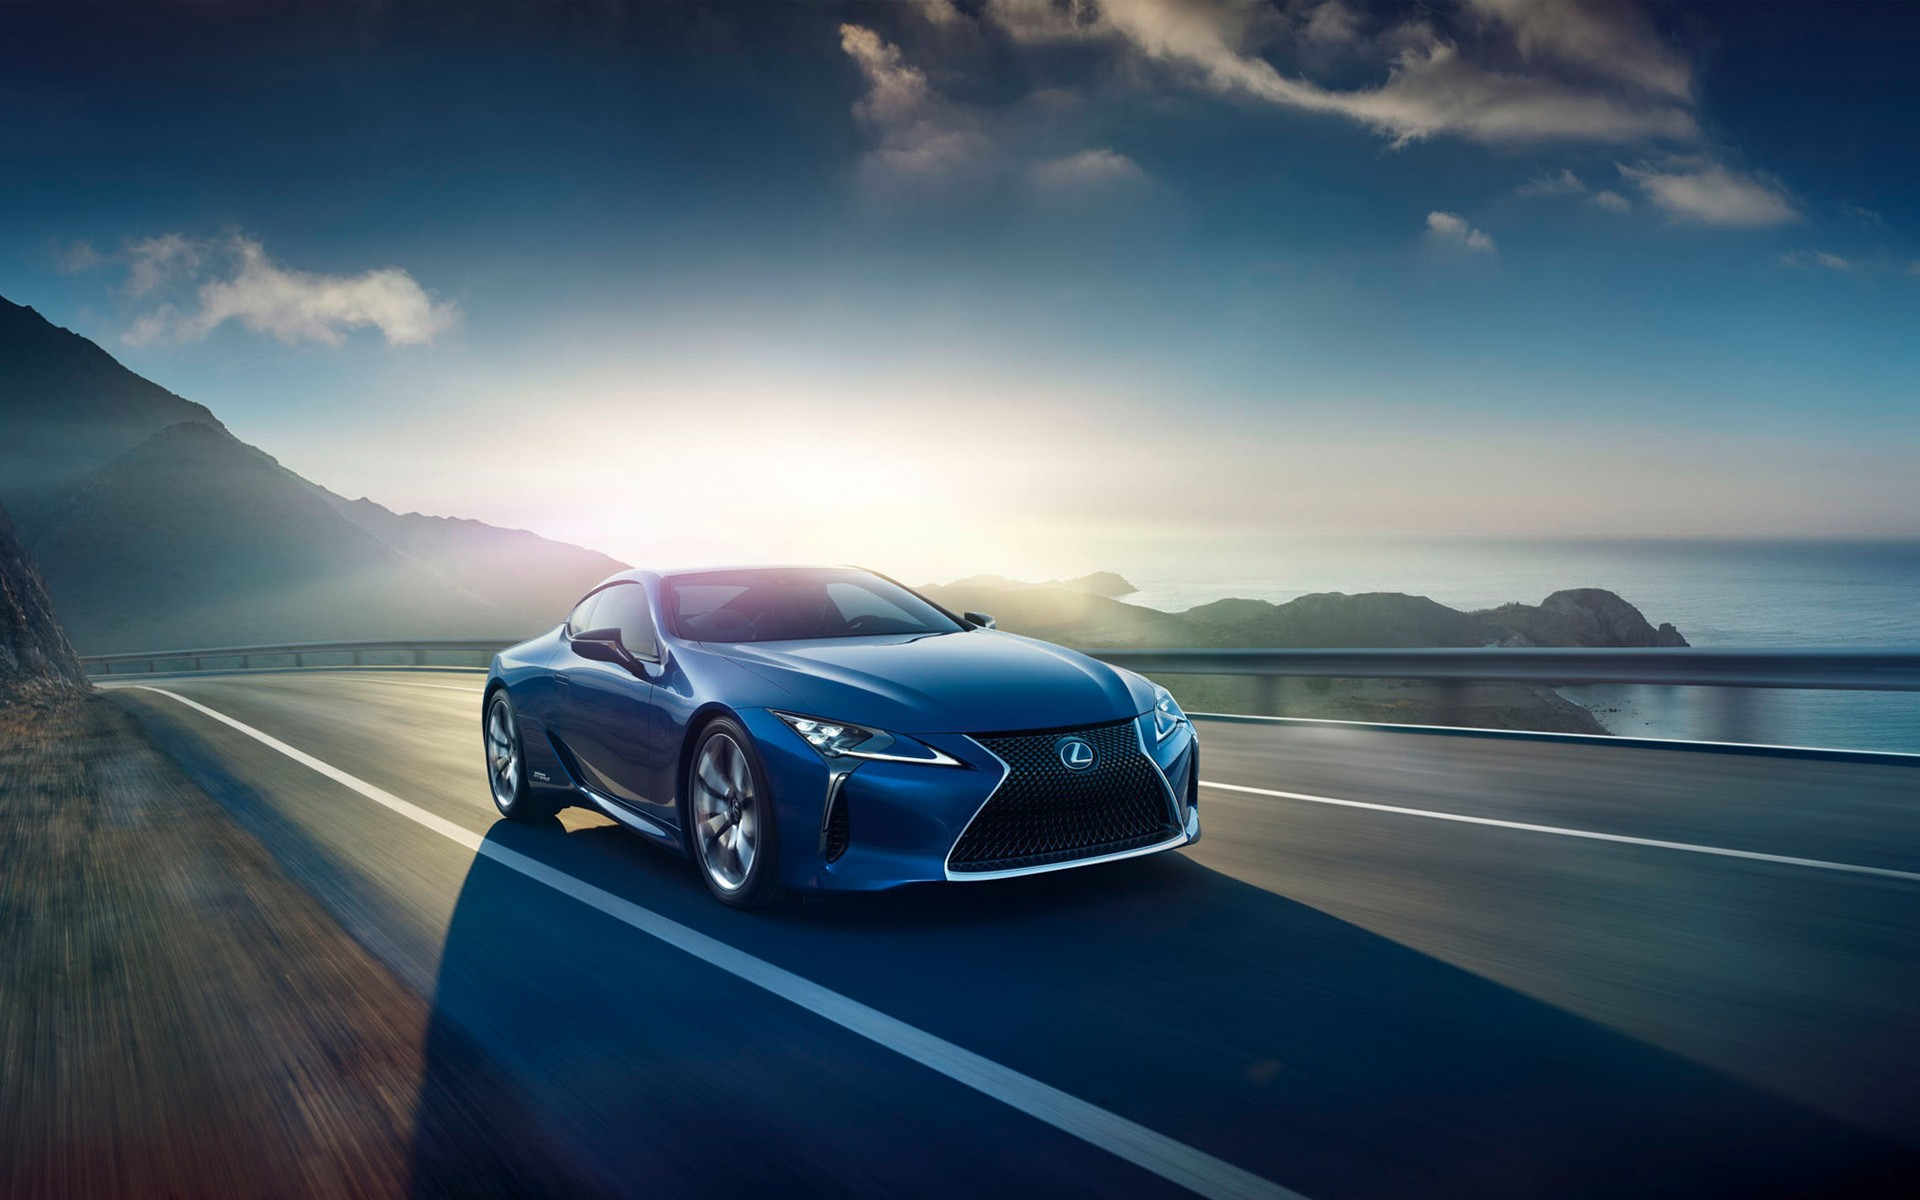 2016 lexus lc 500h luxury coupe wallpaper hd car - Luxury car hd wallpaper download ...